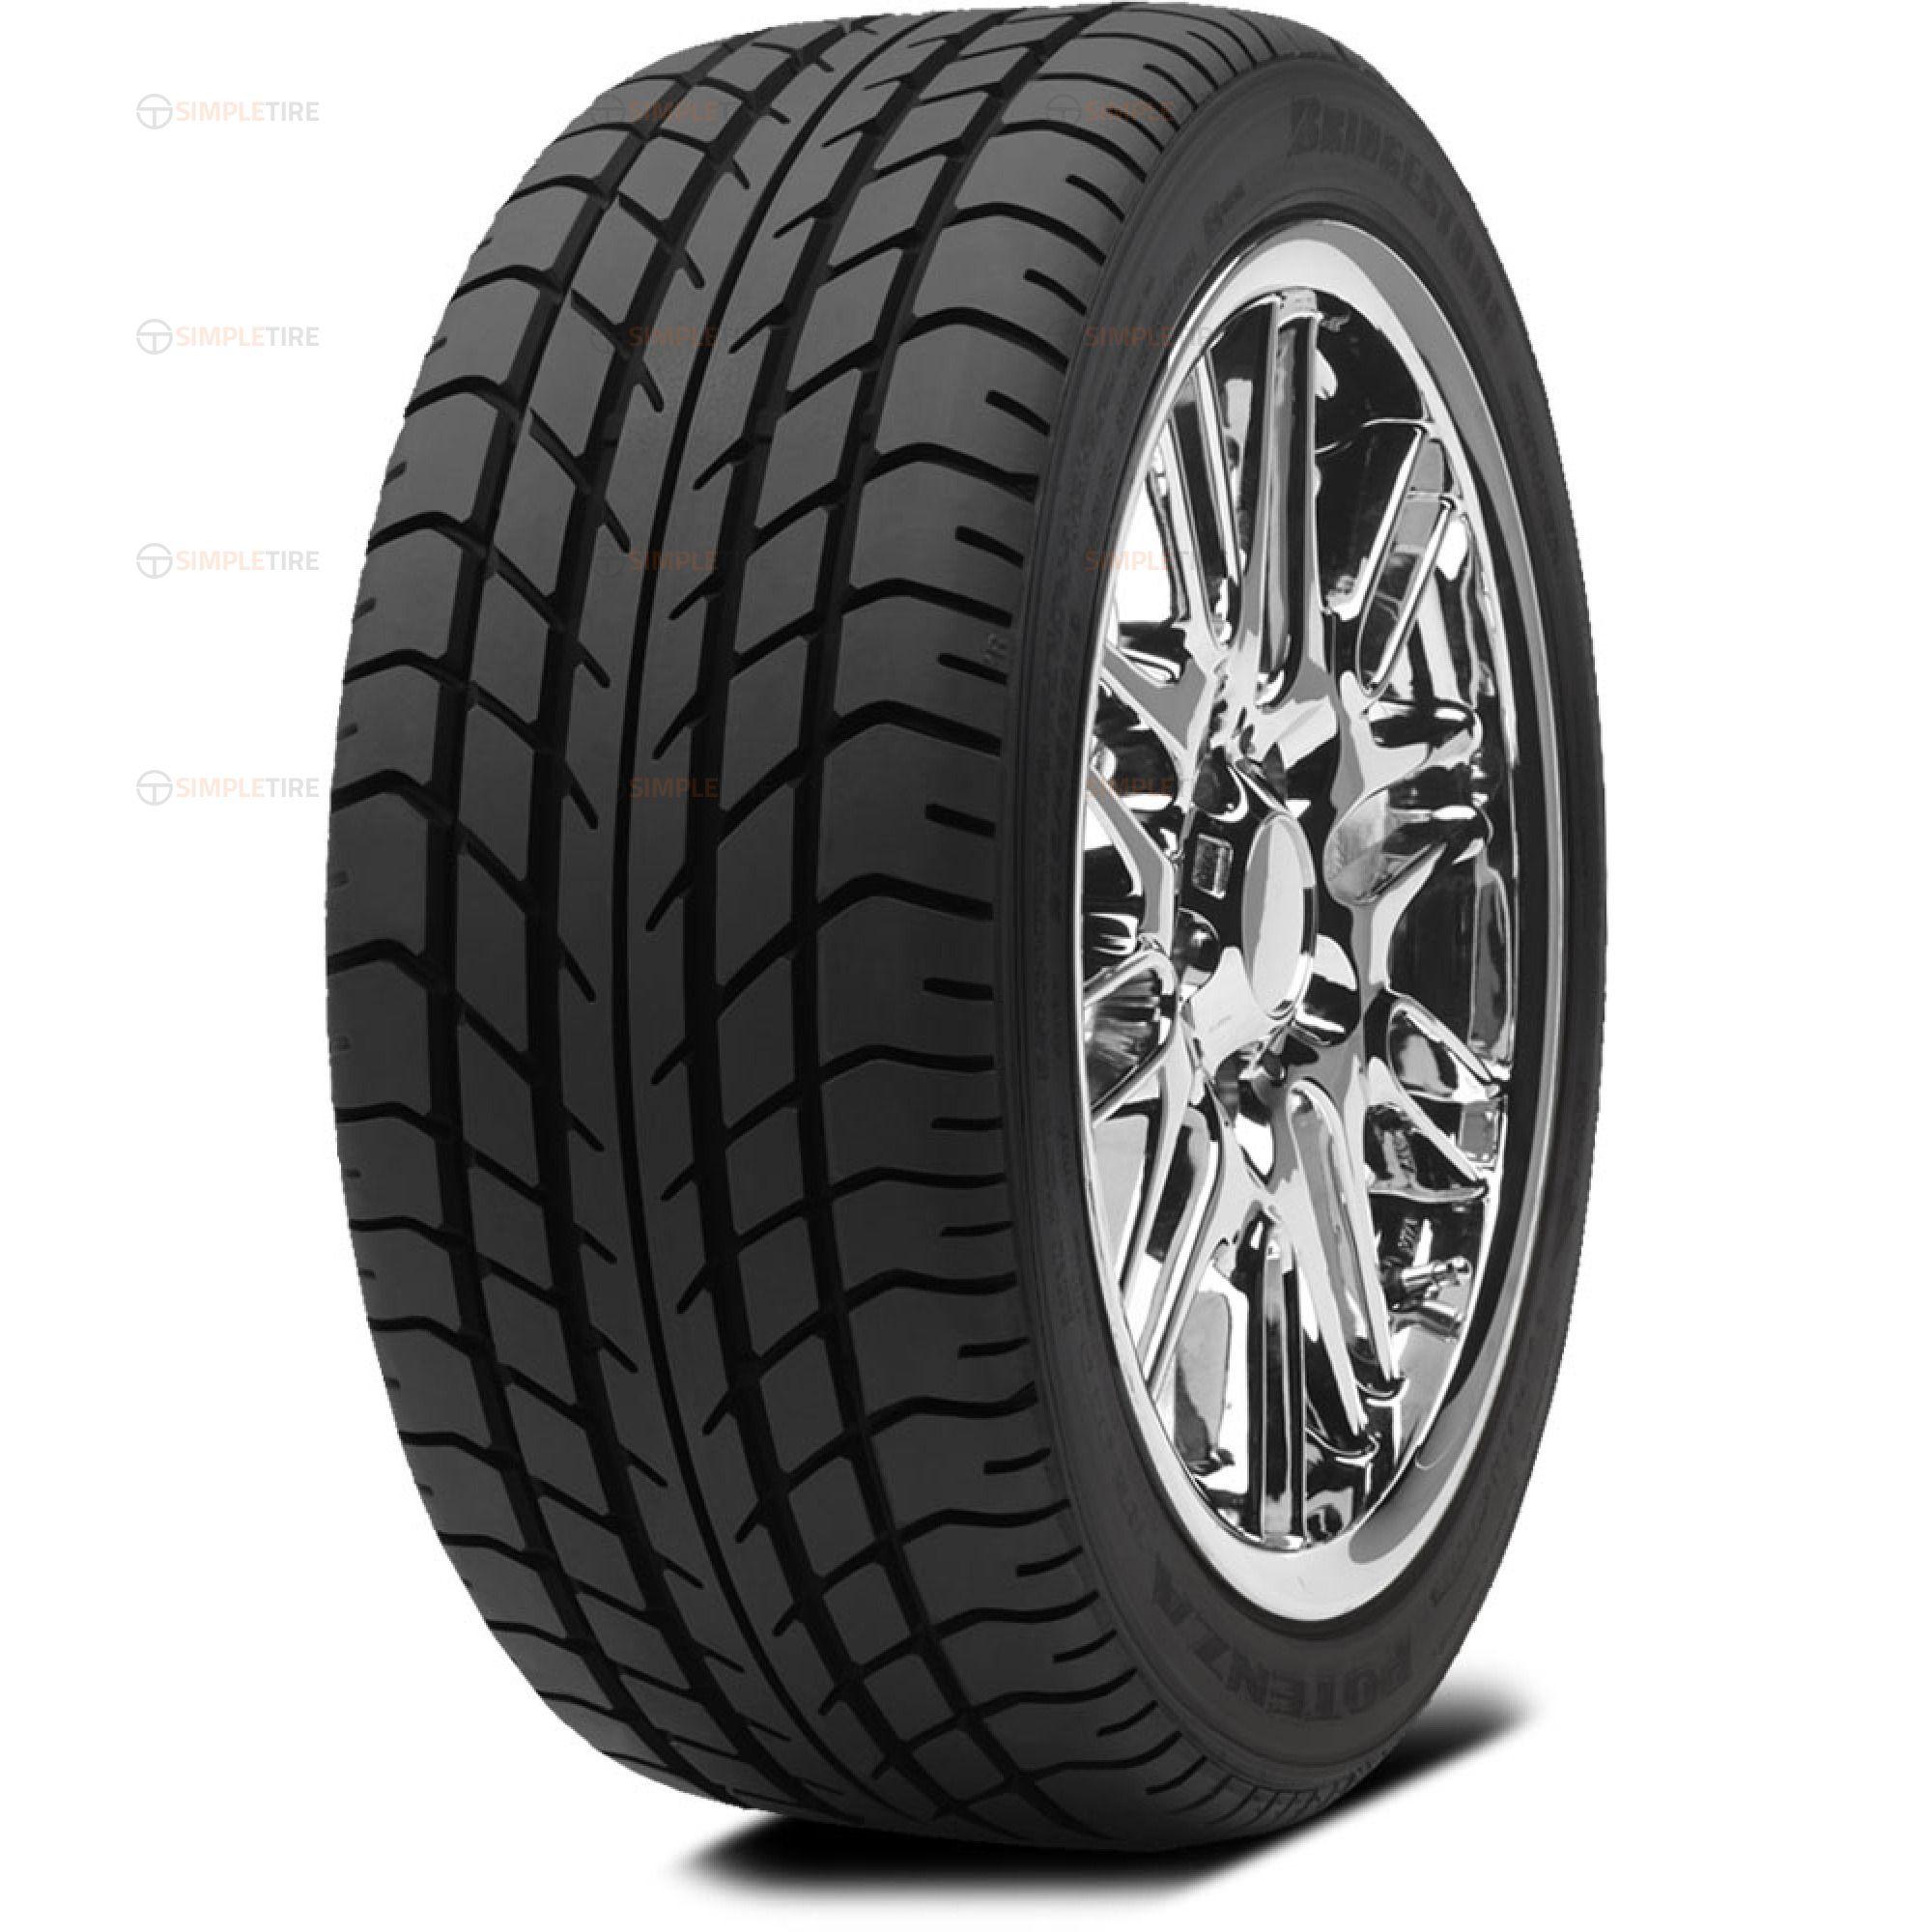 Bridgestone Potenza RE010 215/45R-16 19879